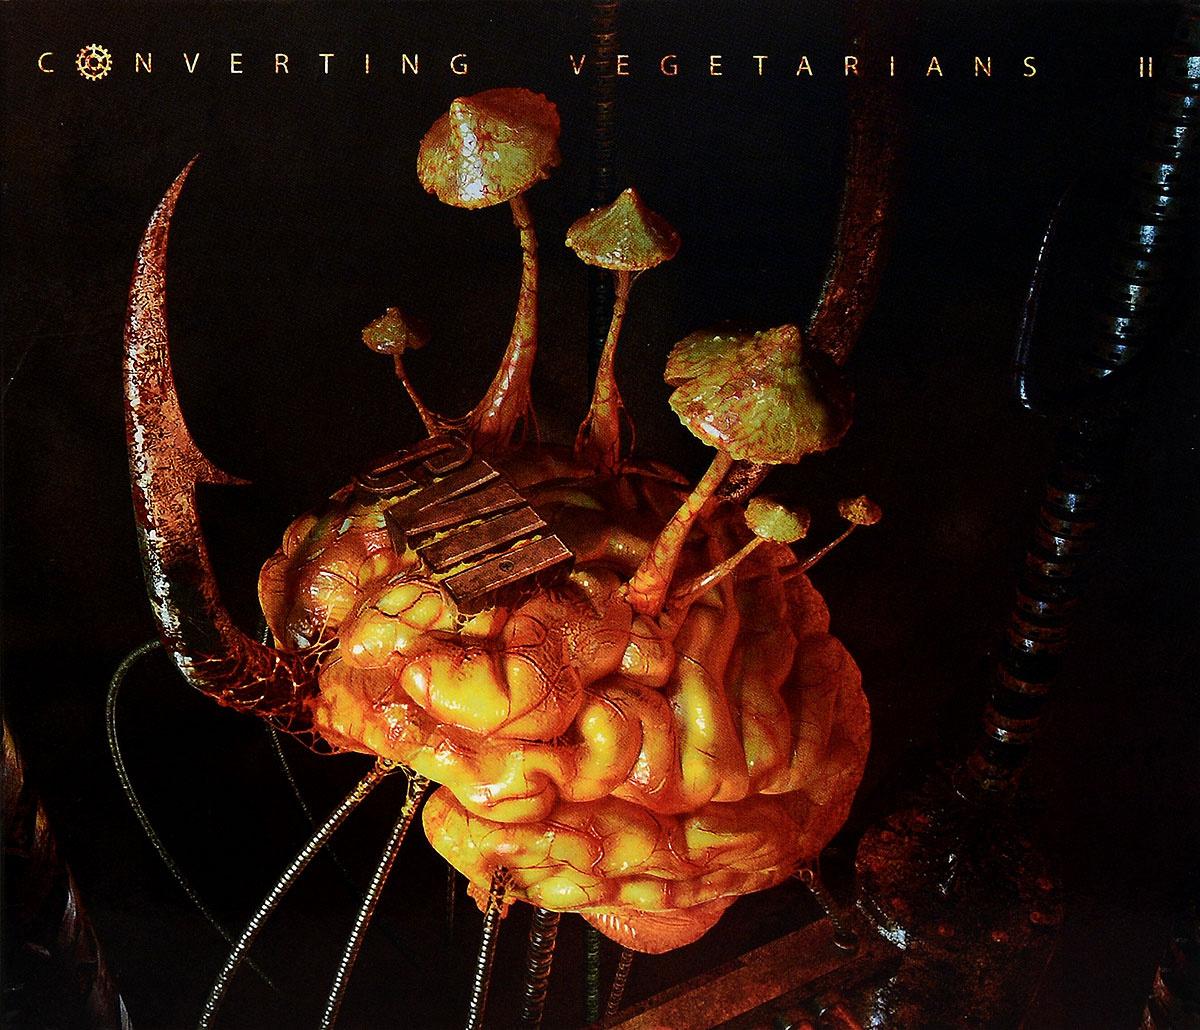 Infected Mushroom. Converting Vegetarians II #1